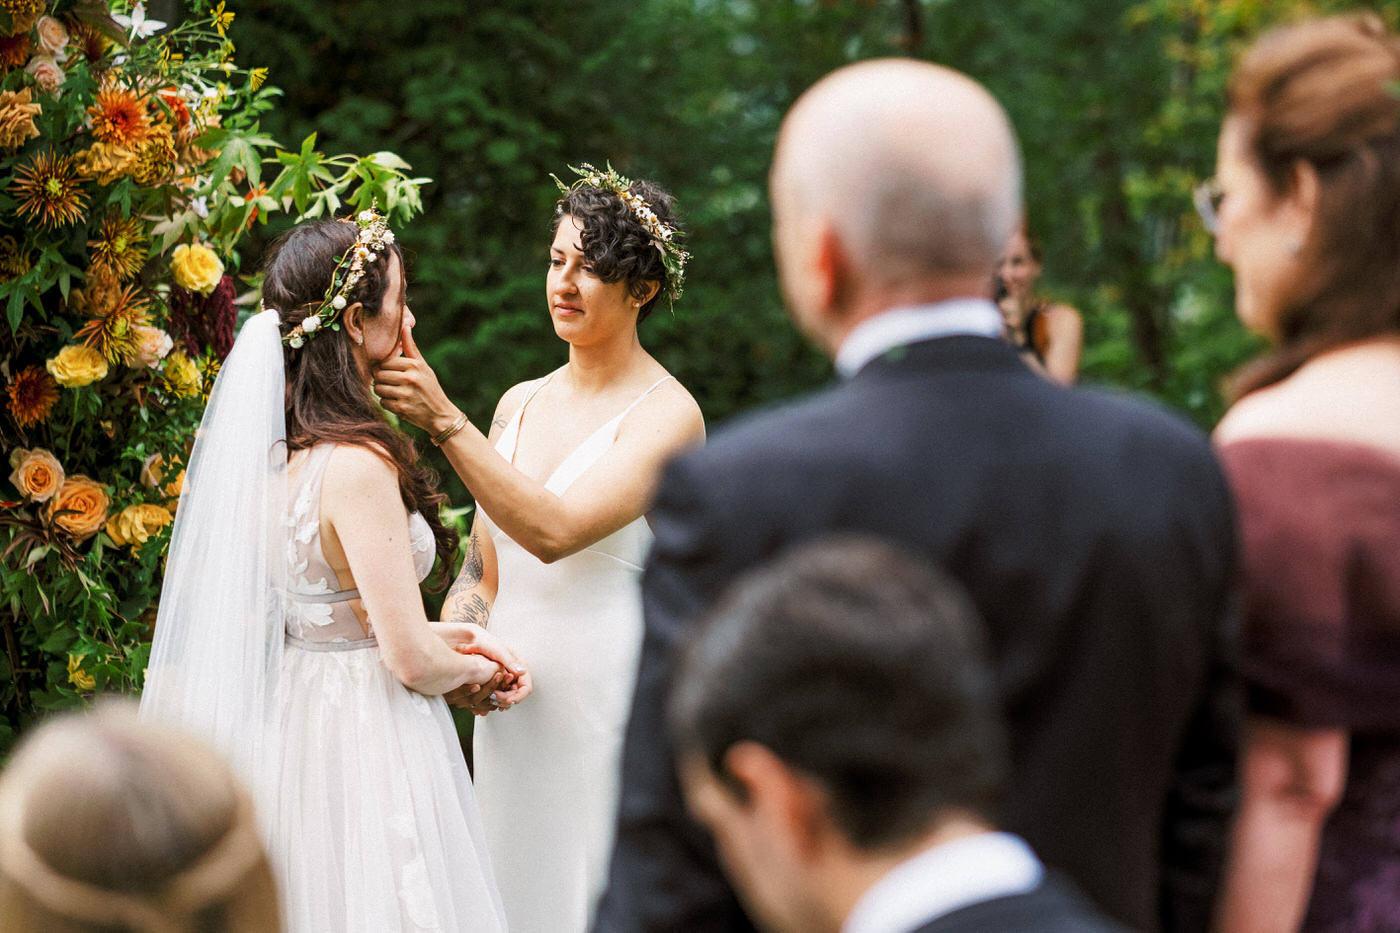 263-pacific-northwest-wedding-photography-by-ryan-flynn.jpg